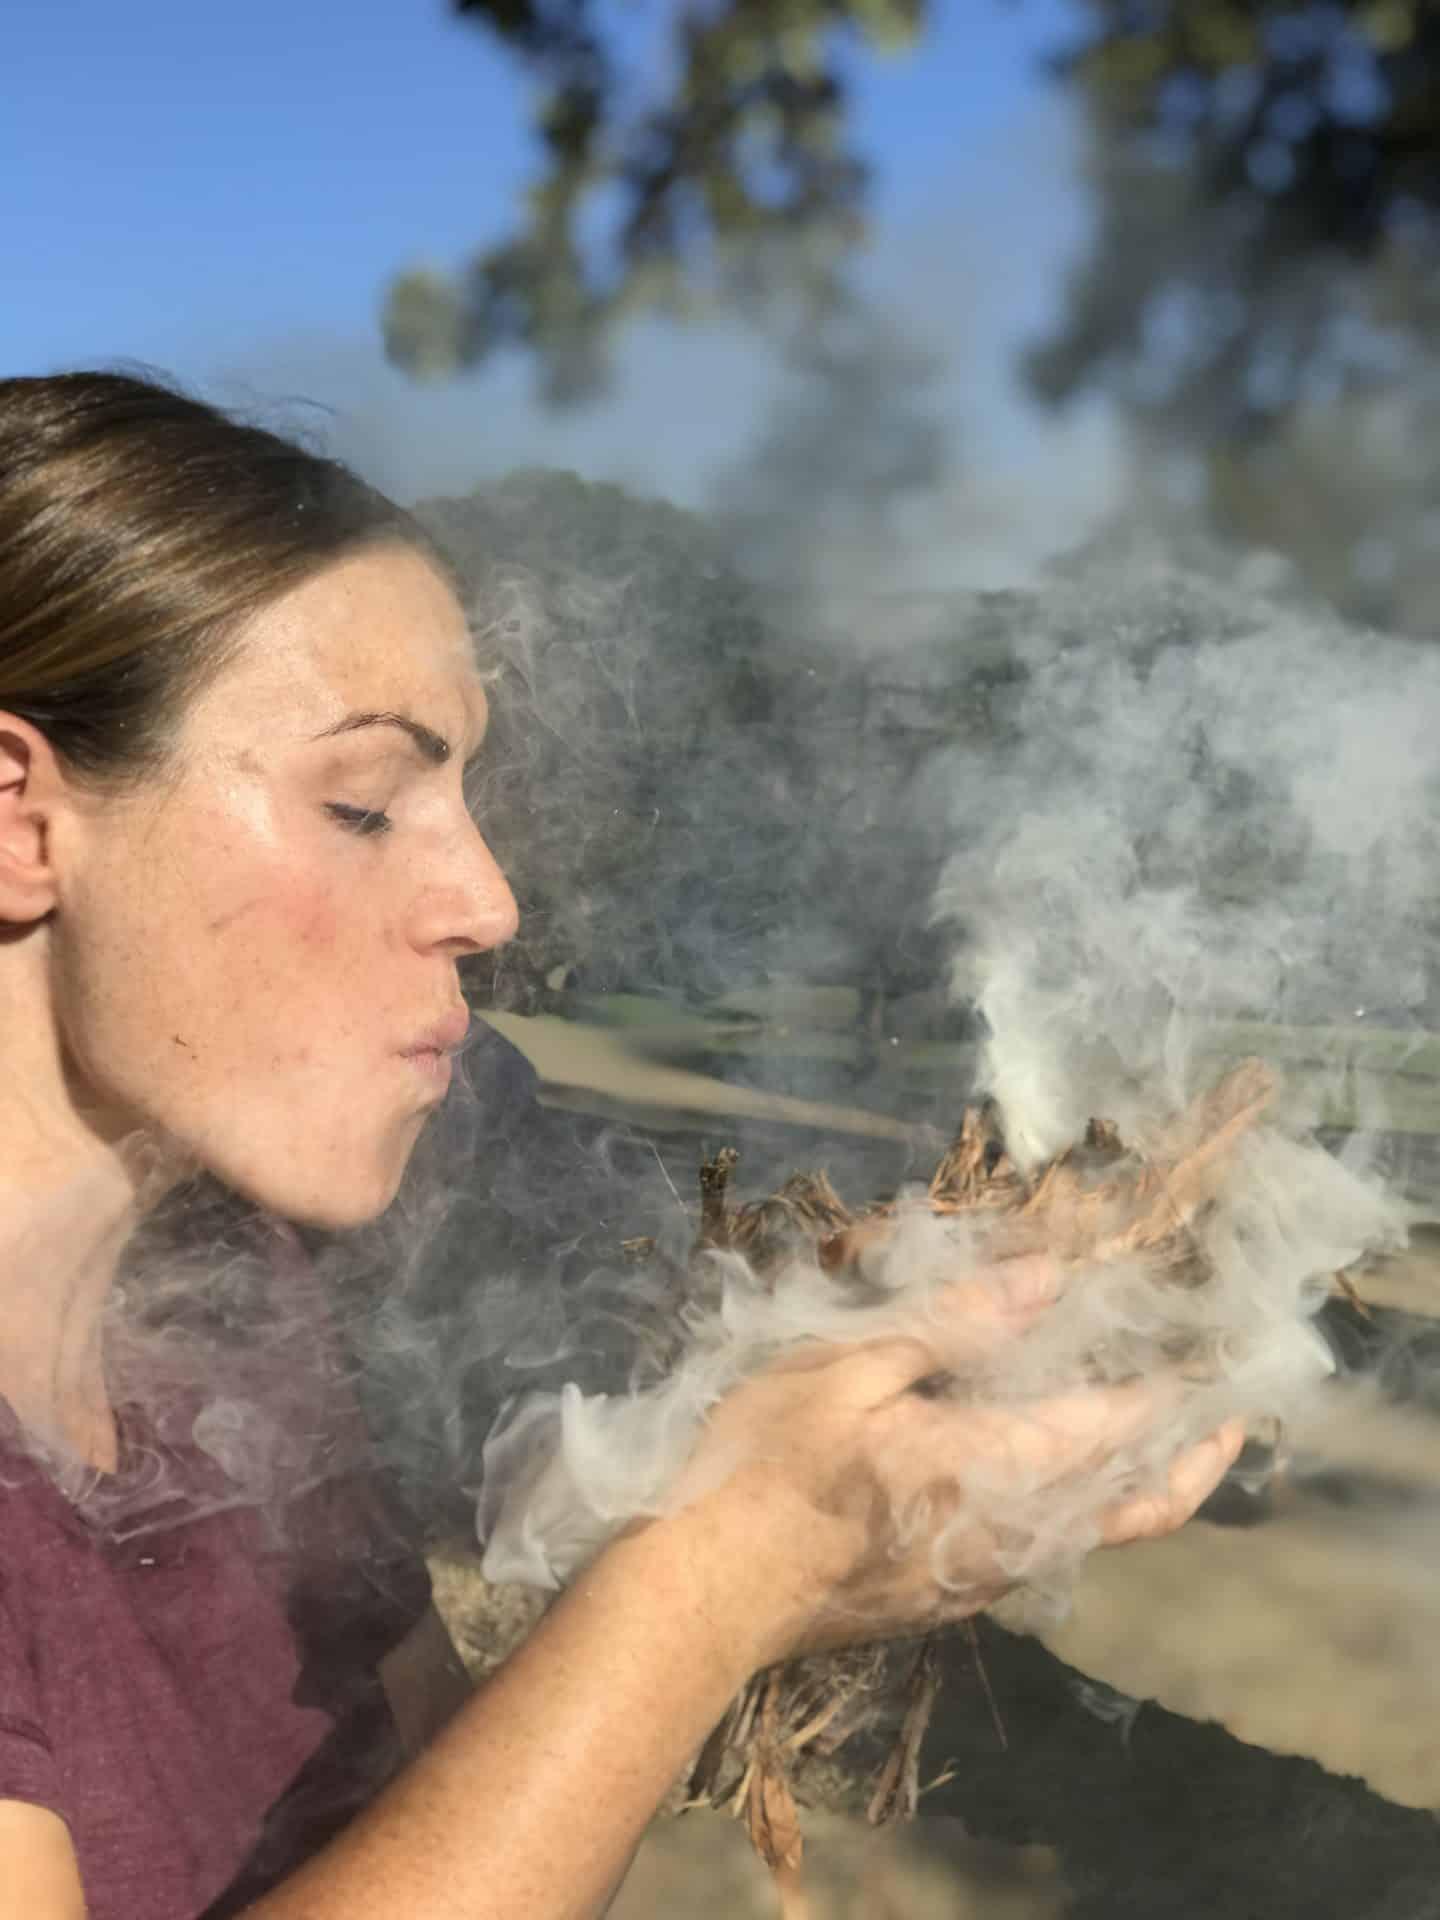 Survivalist blows on smoking brush